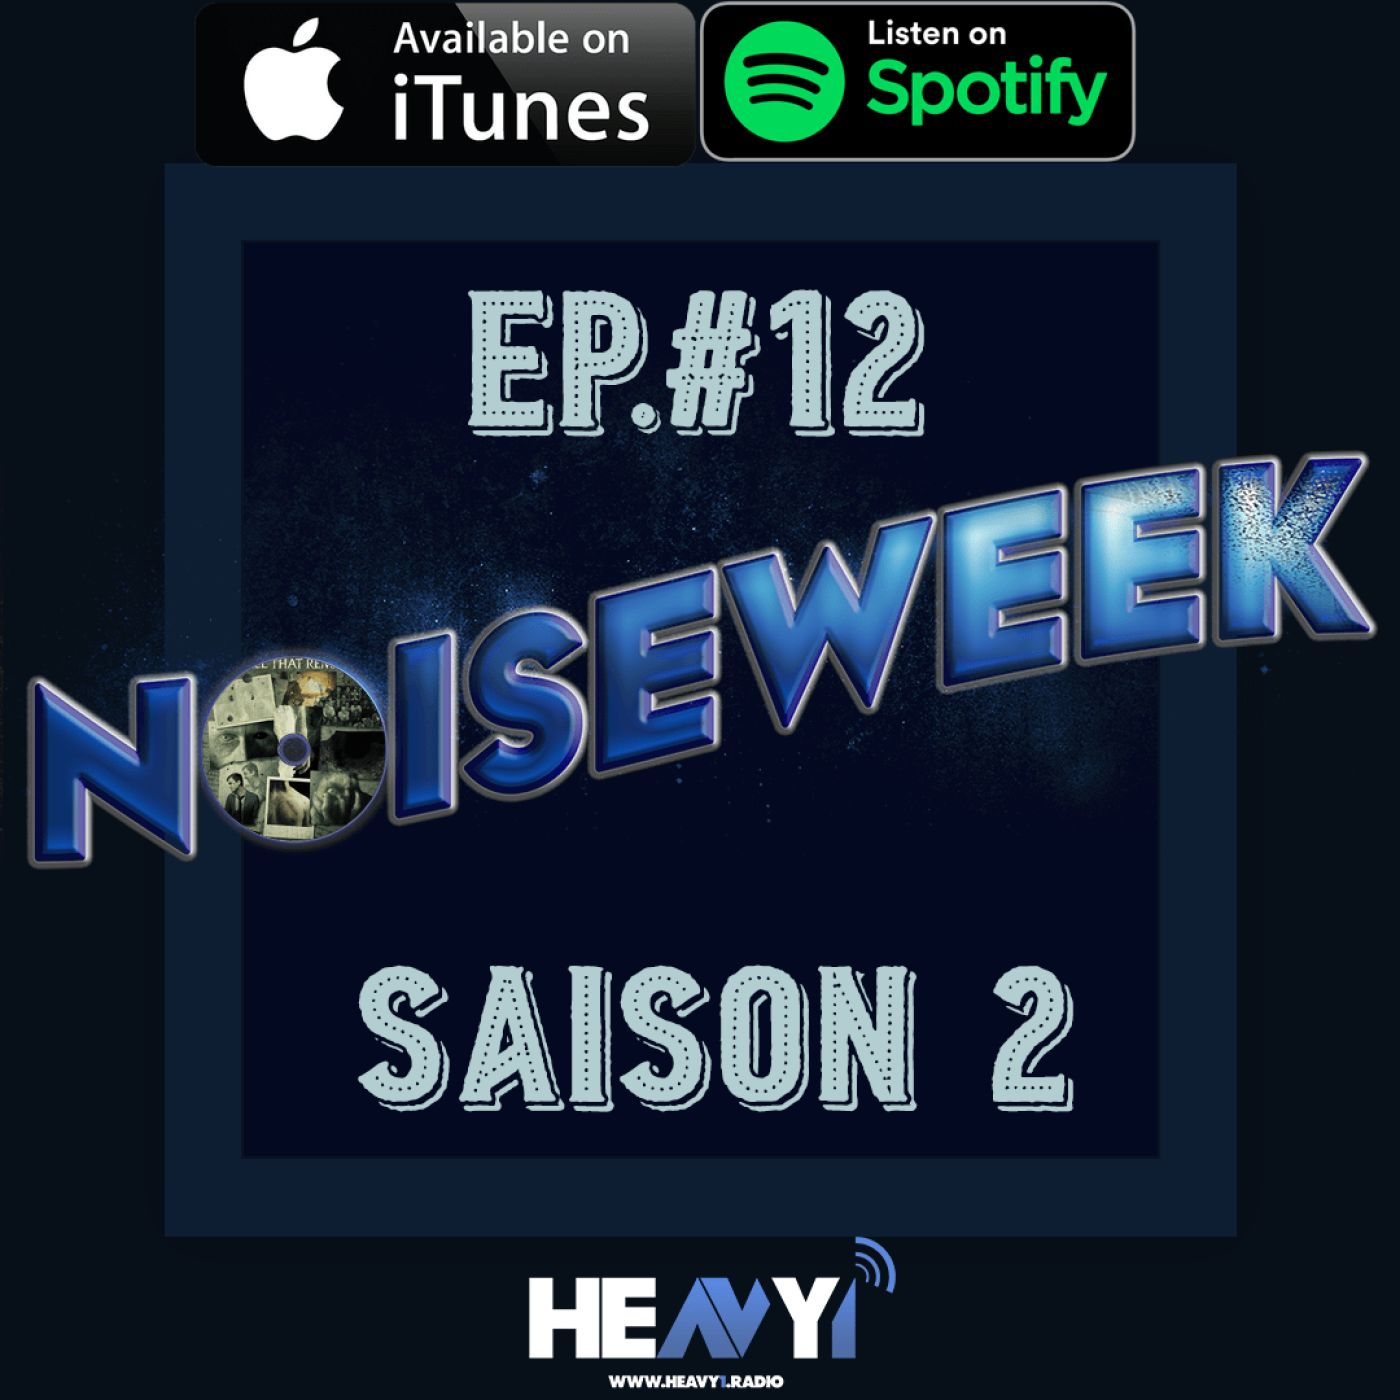 Noiseweek #12 Saison 2